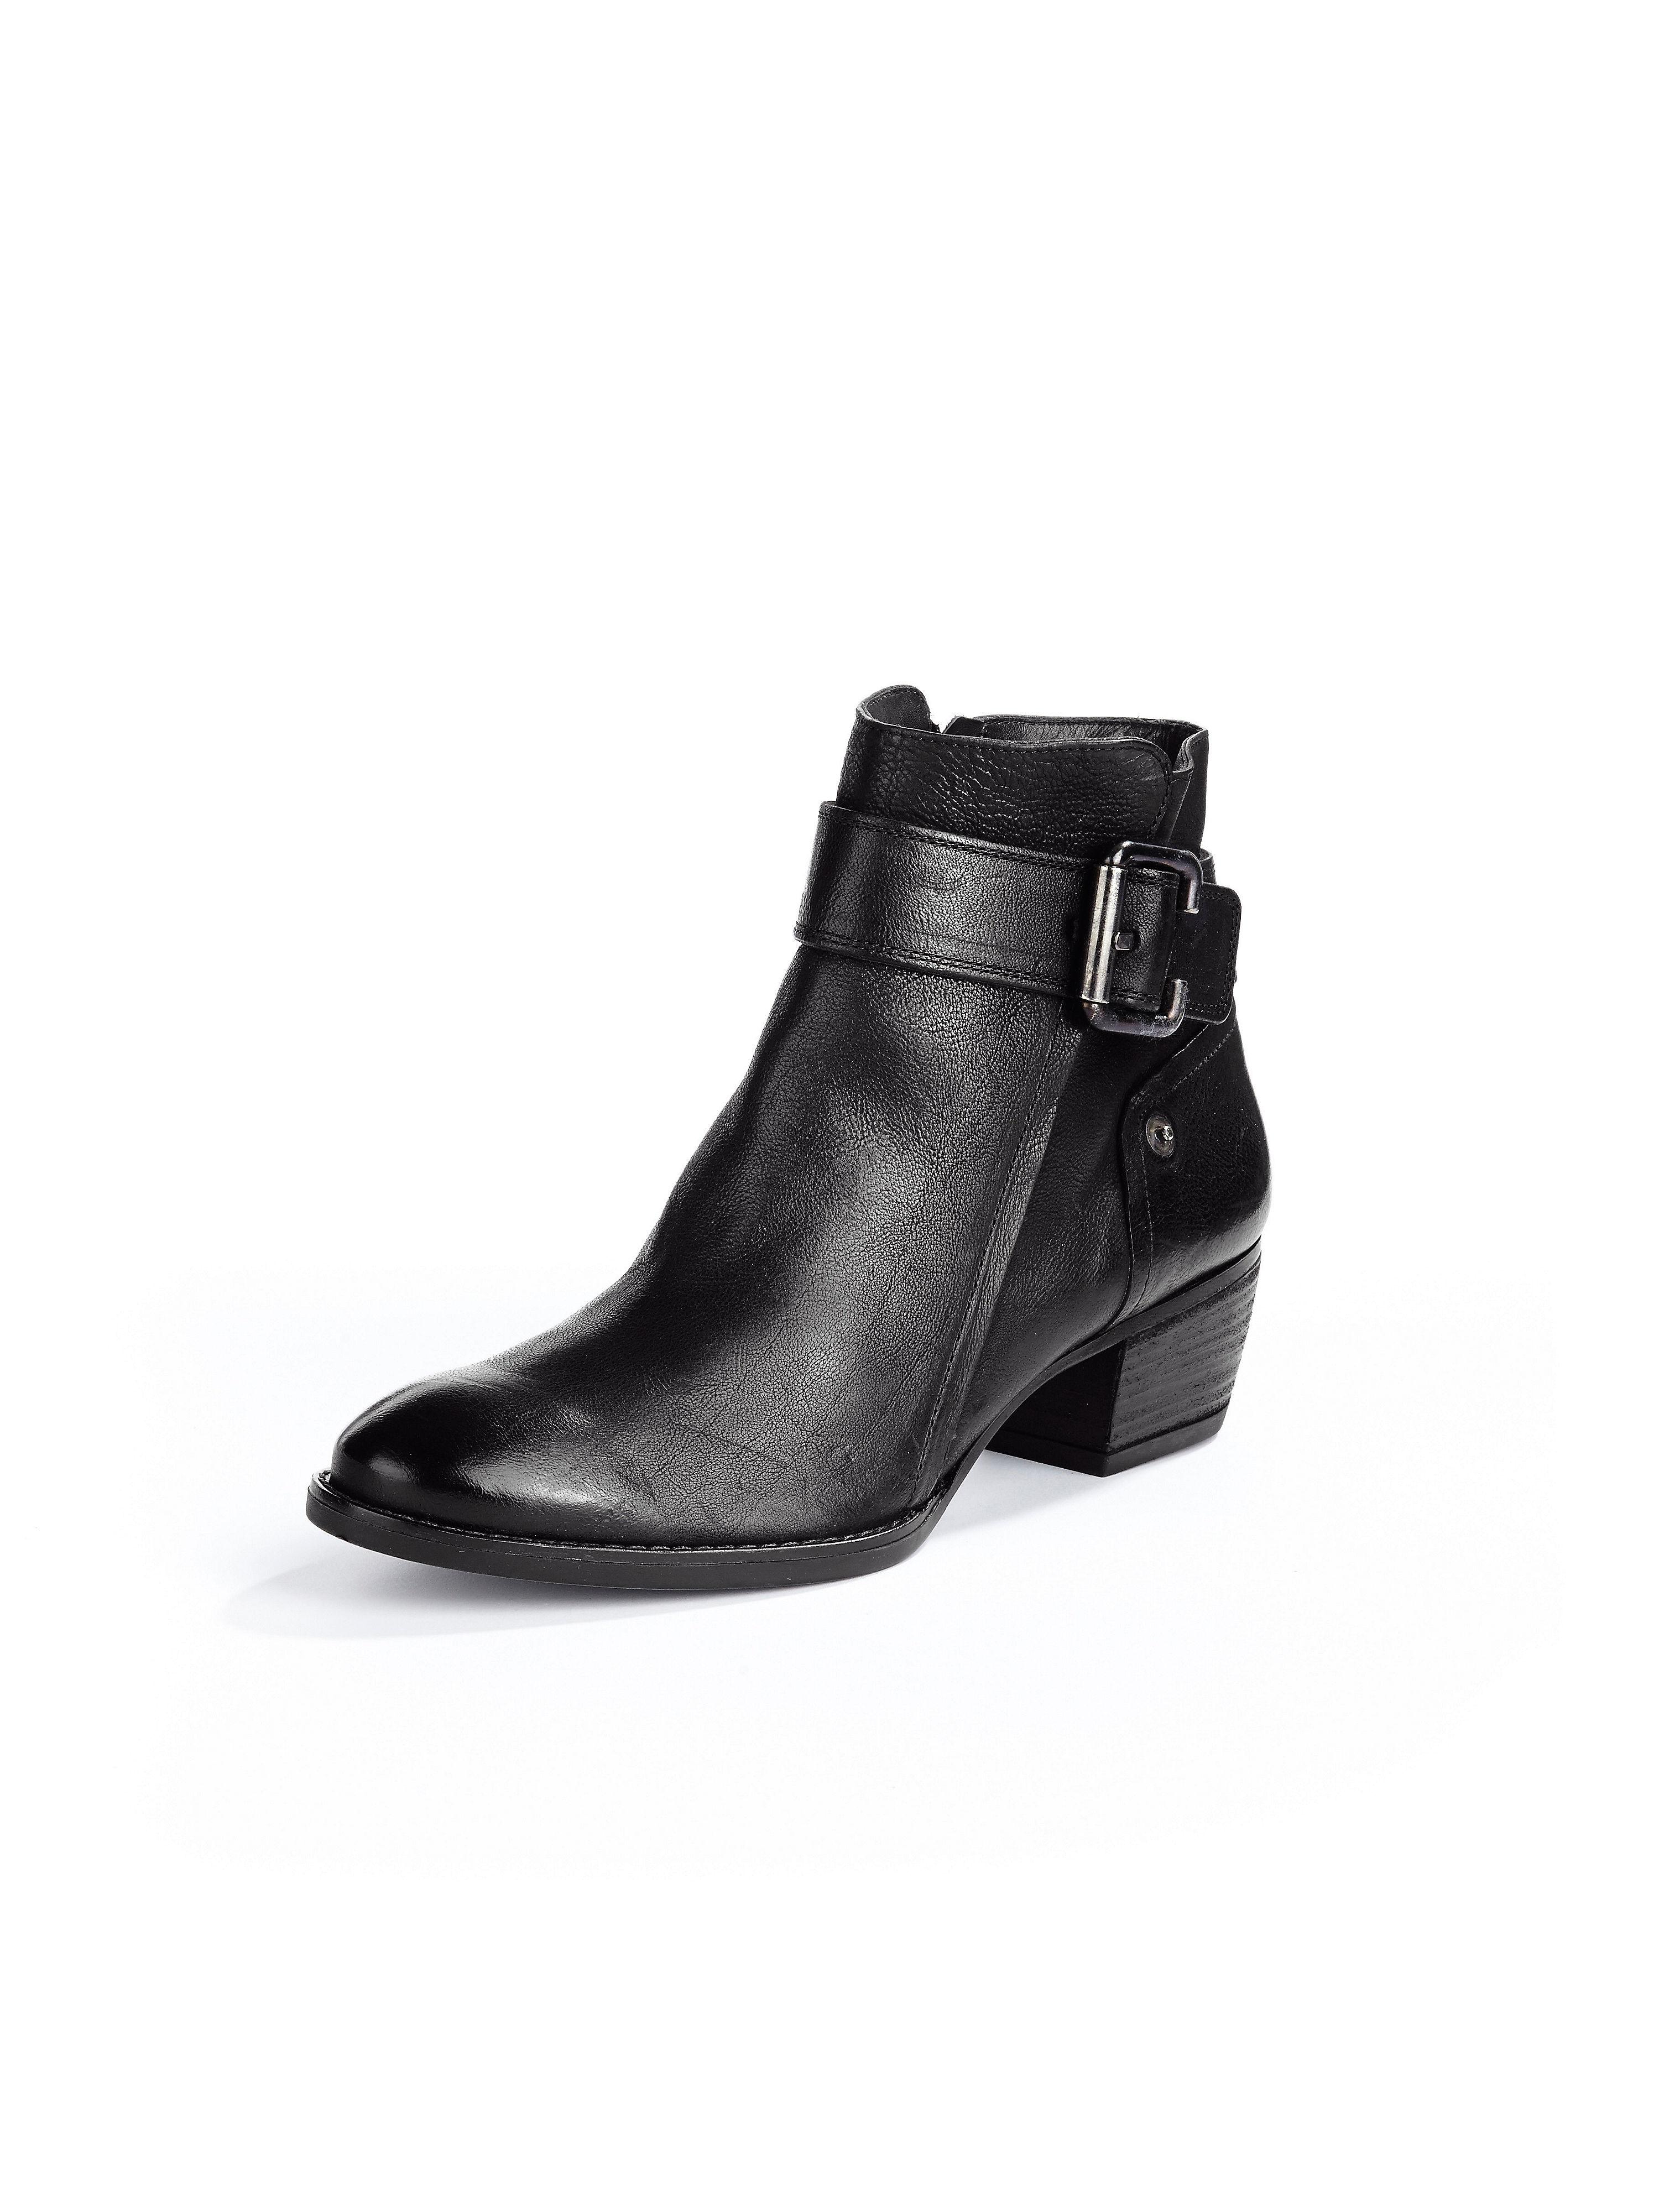 ankle boots paul green black size 375. Black Bedroom Furniture Sets. Home Design Ideas